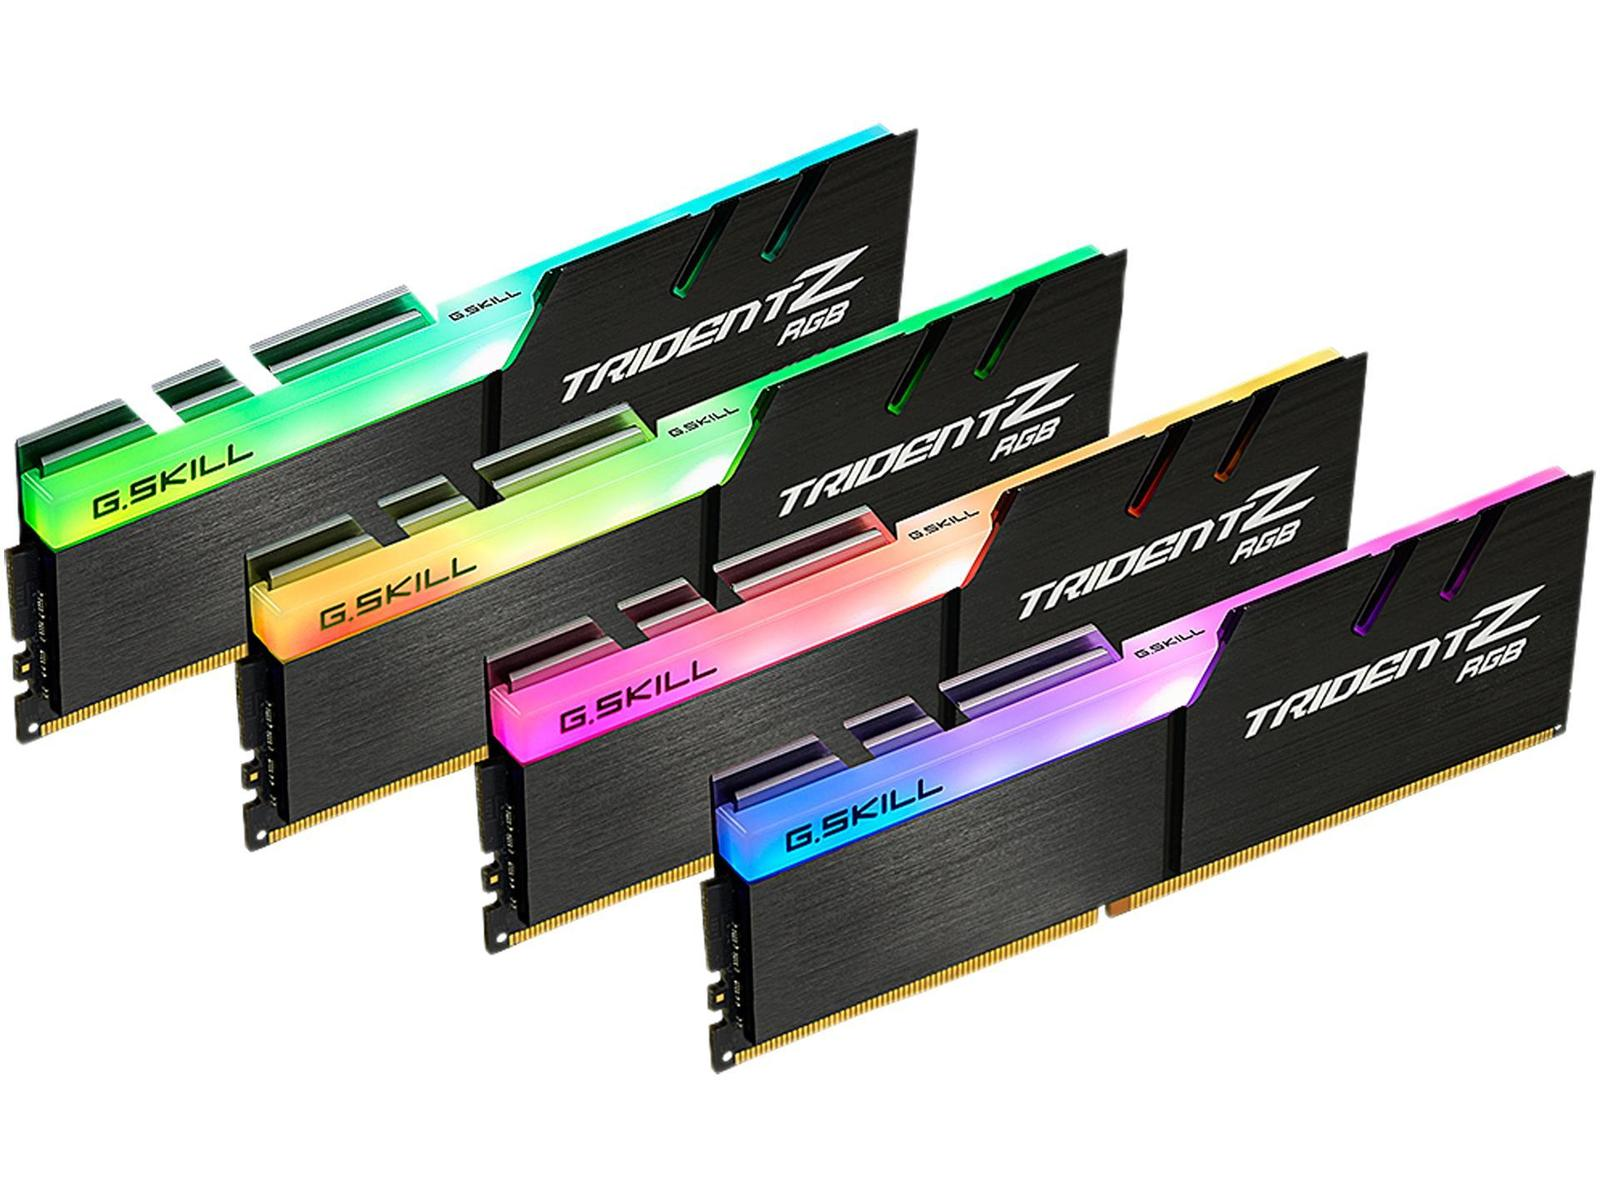 G.Skill Trident Z RGB 32 GB (4 x 8 GB) DDR4-3600 CL19 Memory